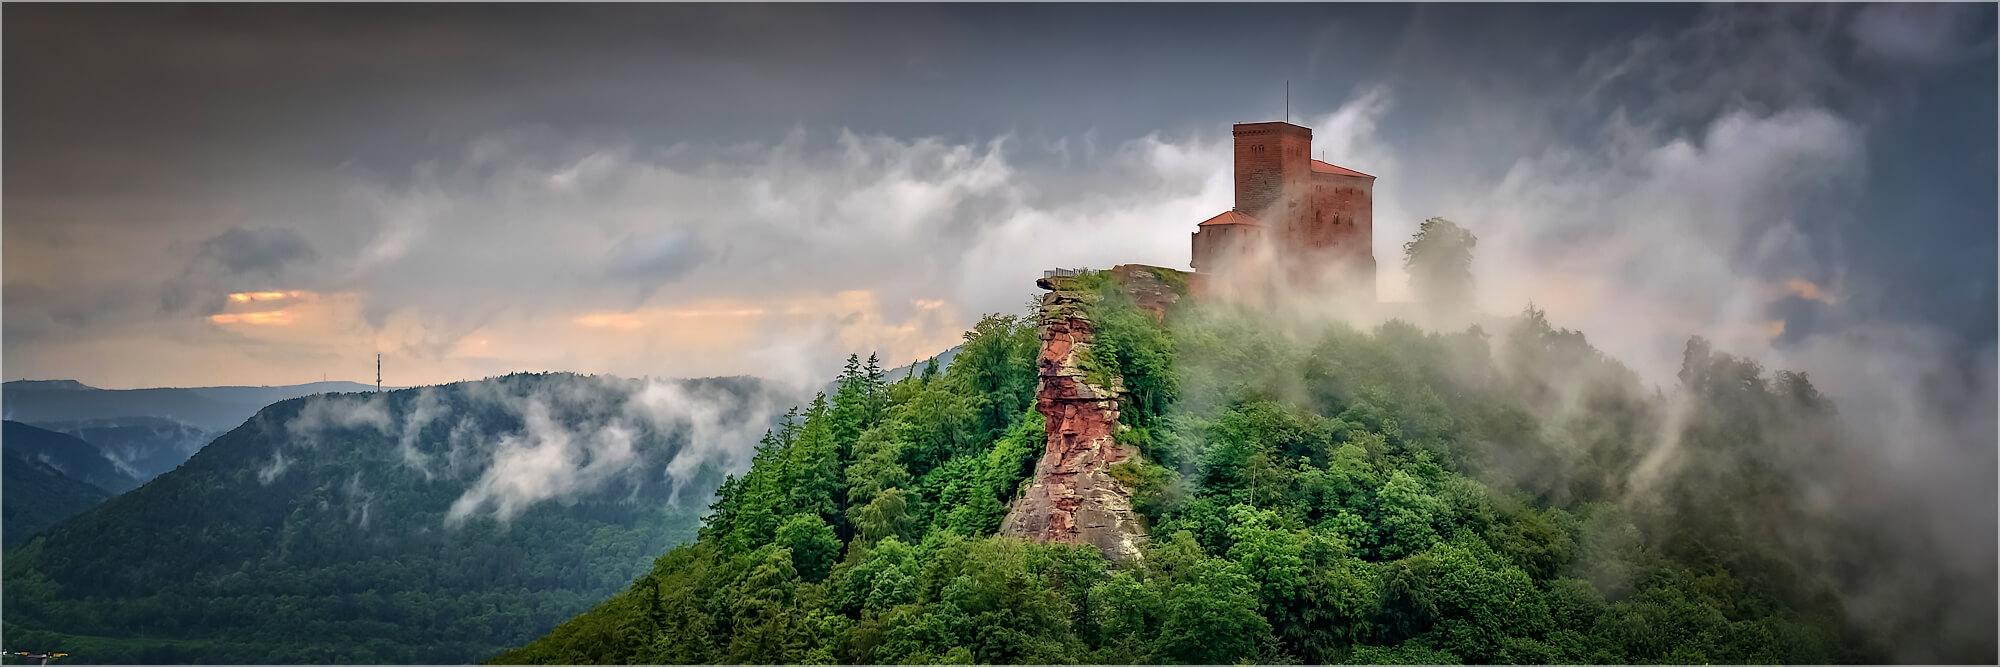 Panoramafoto nach dem Sommergwitter Pfalz Burg Trifels